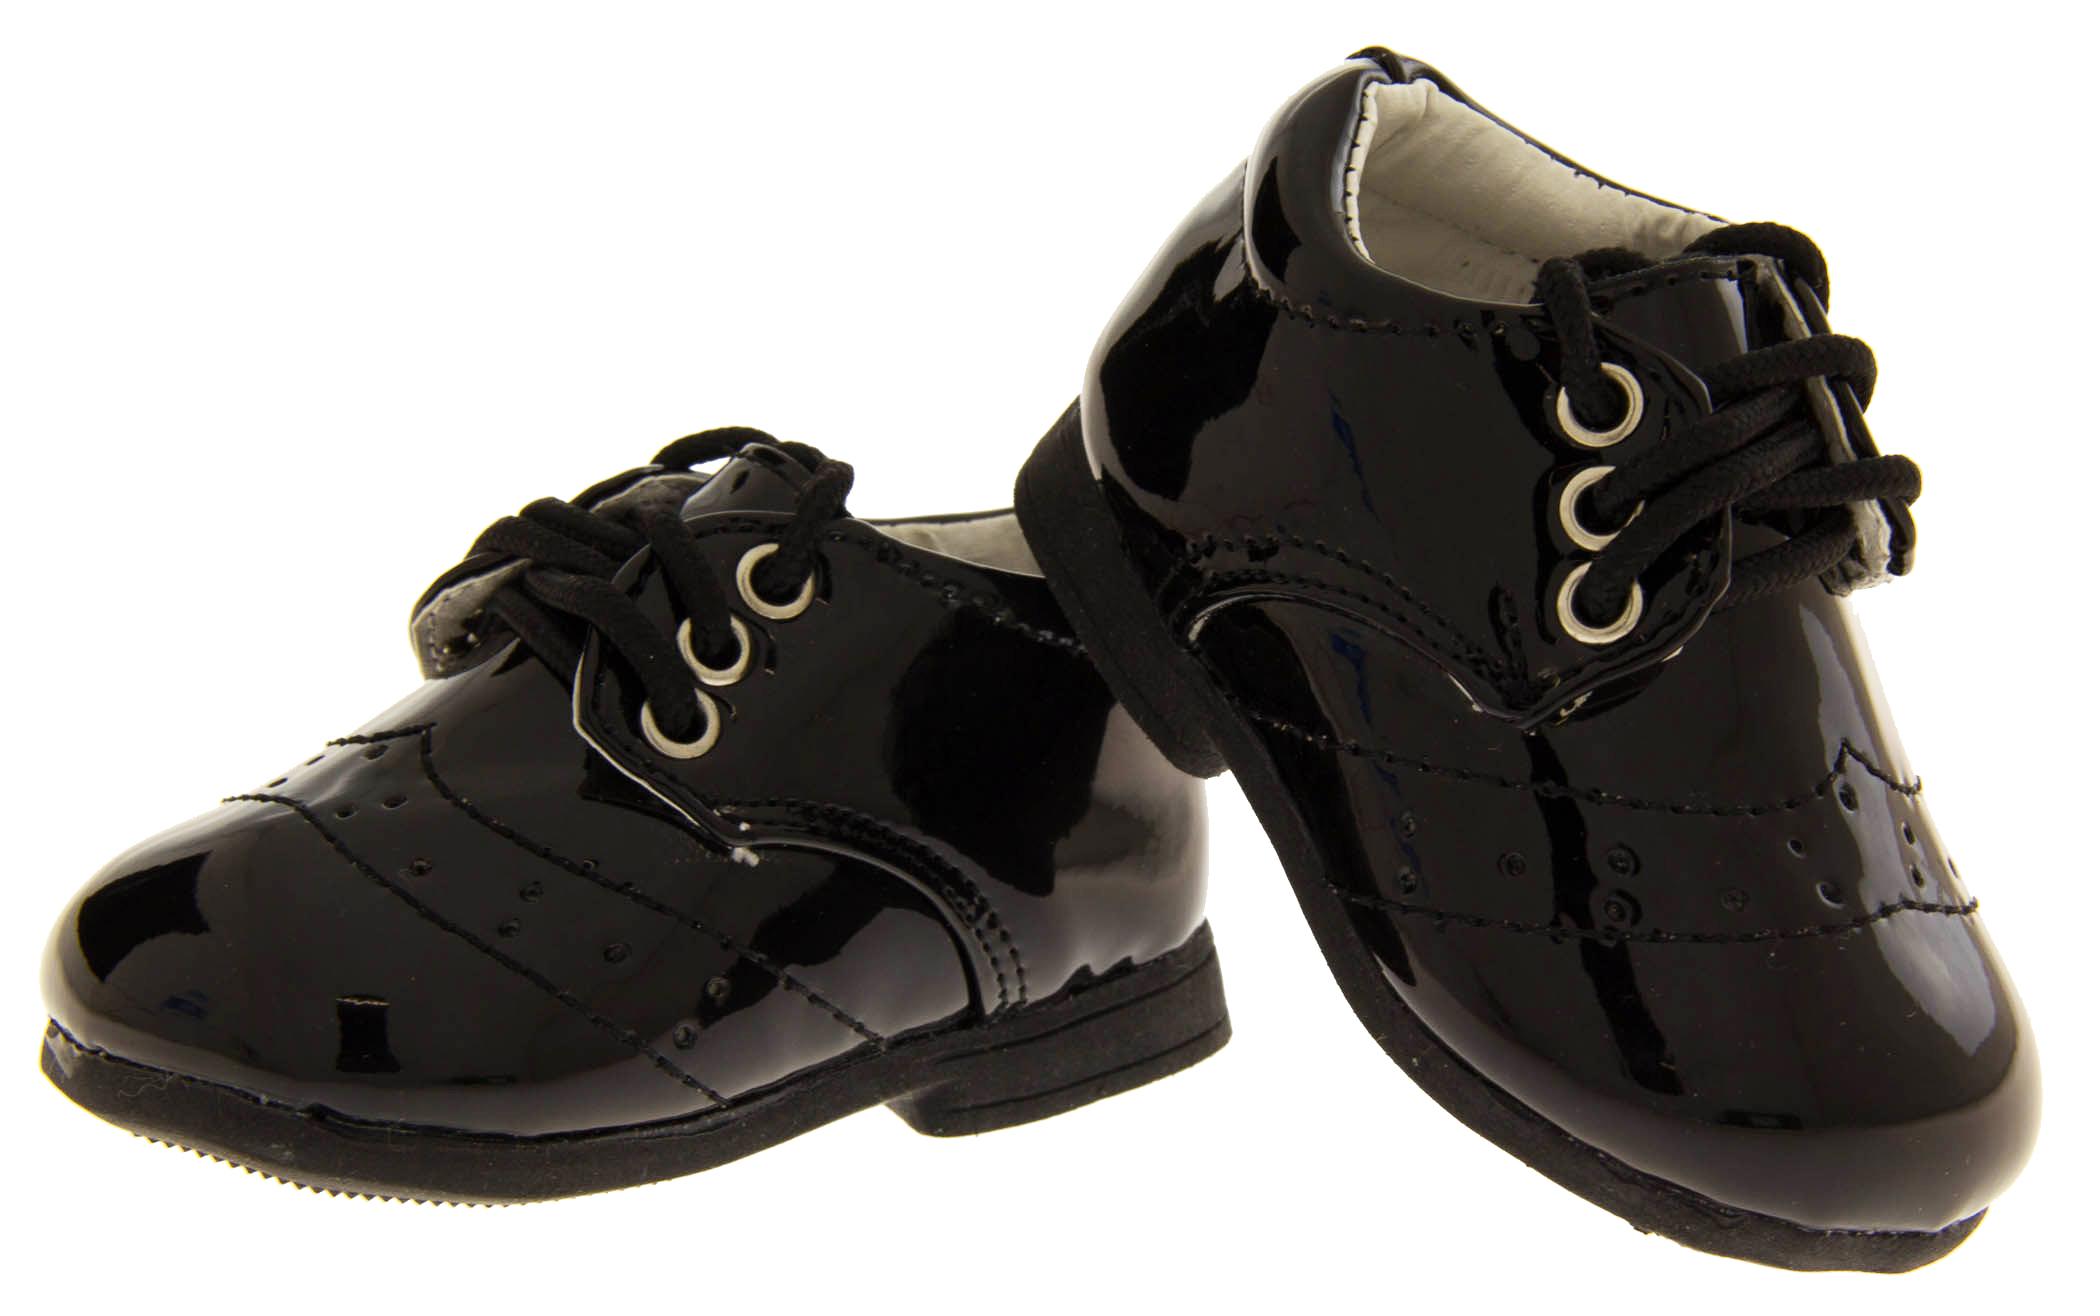 Tiny Baby Newborn Boys S Black Laces Christening Wedding Shoes Sz Size 0 1